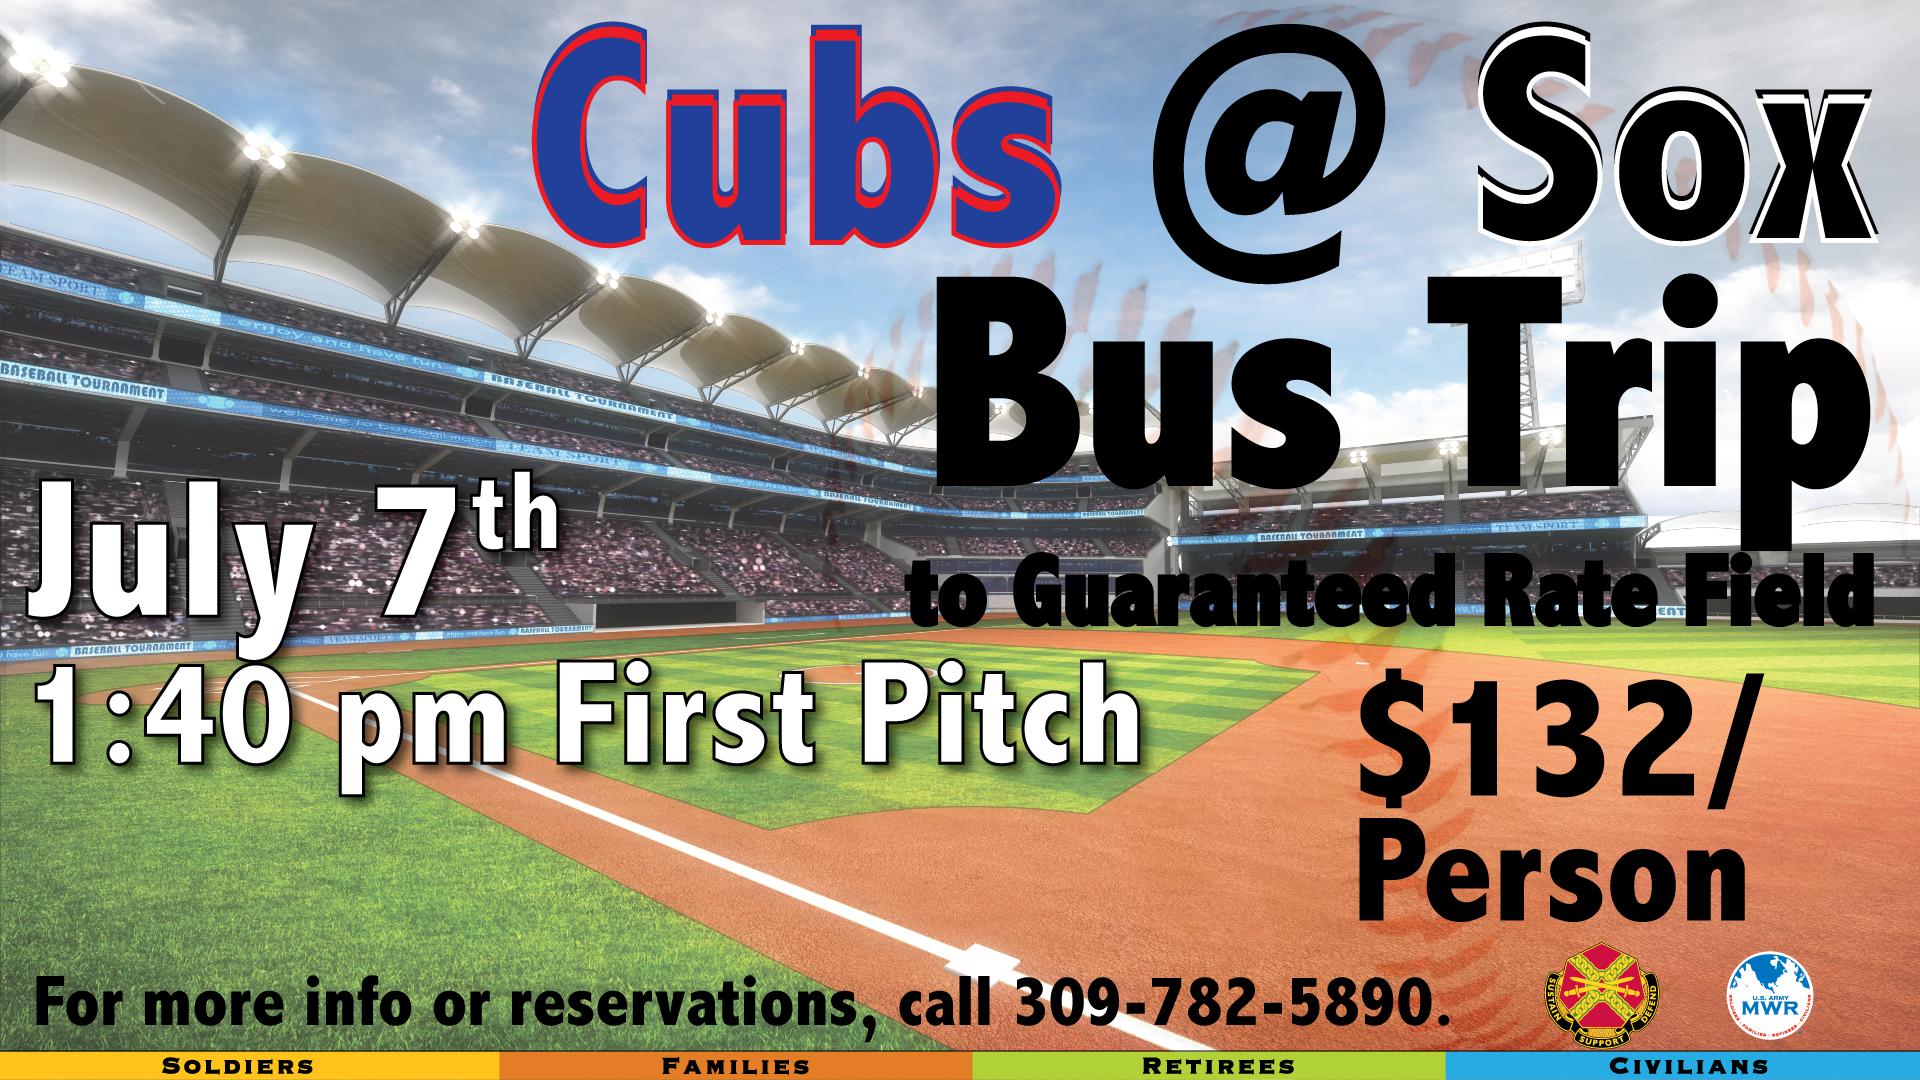 Cubs @ Sox Bus Trip